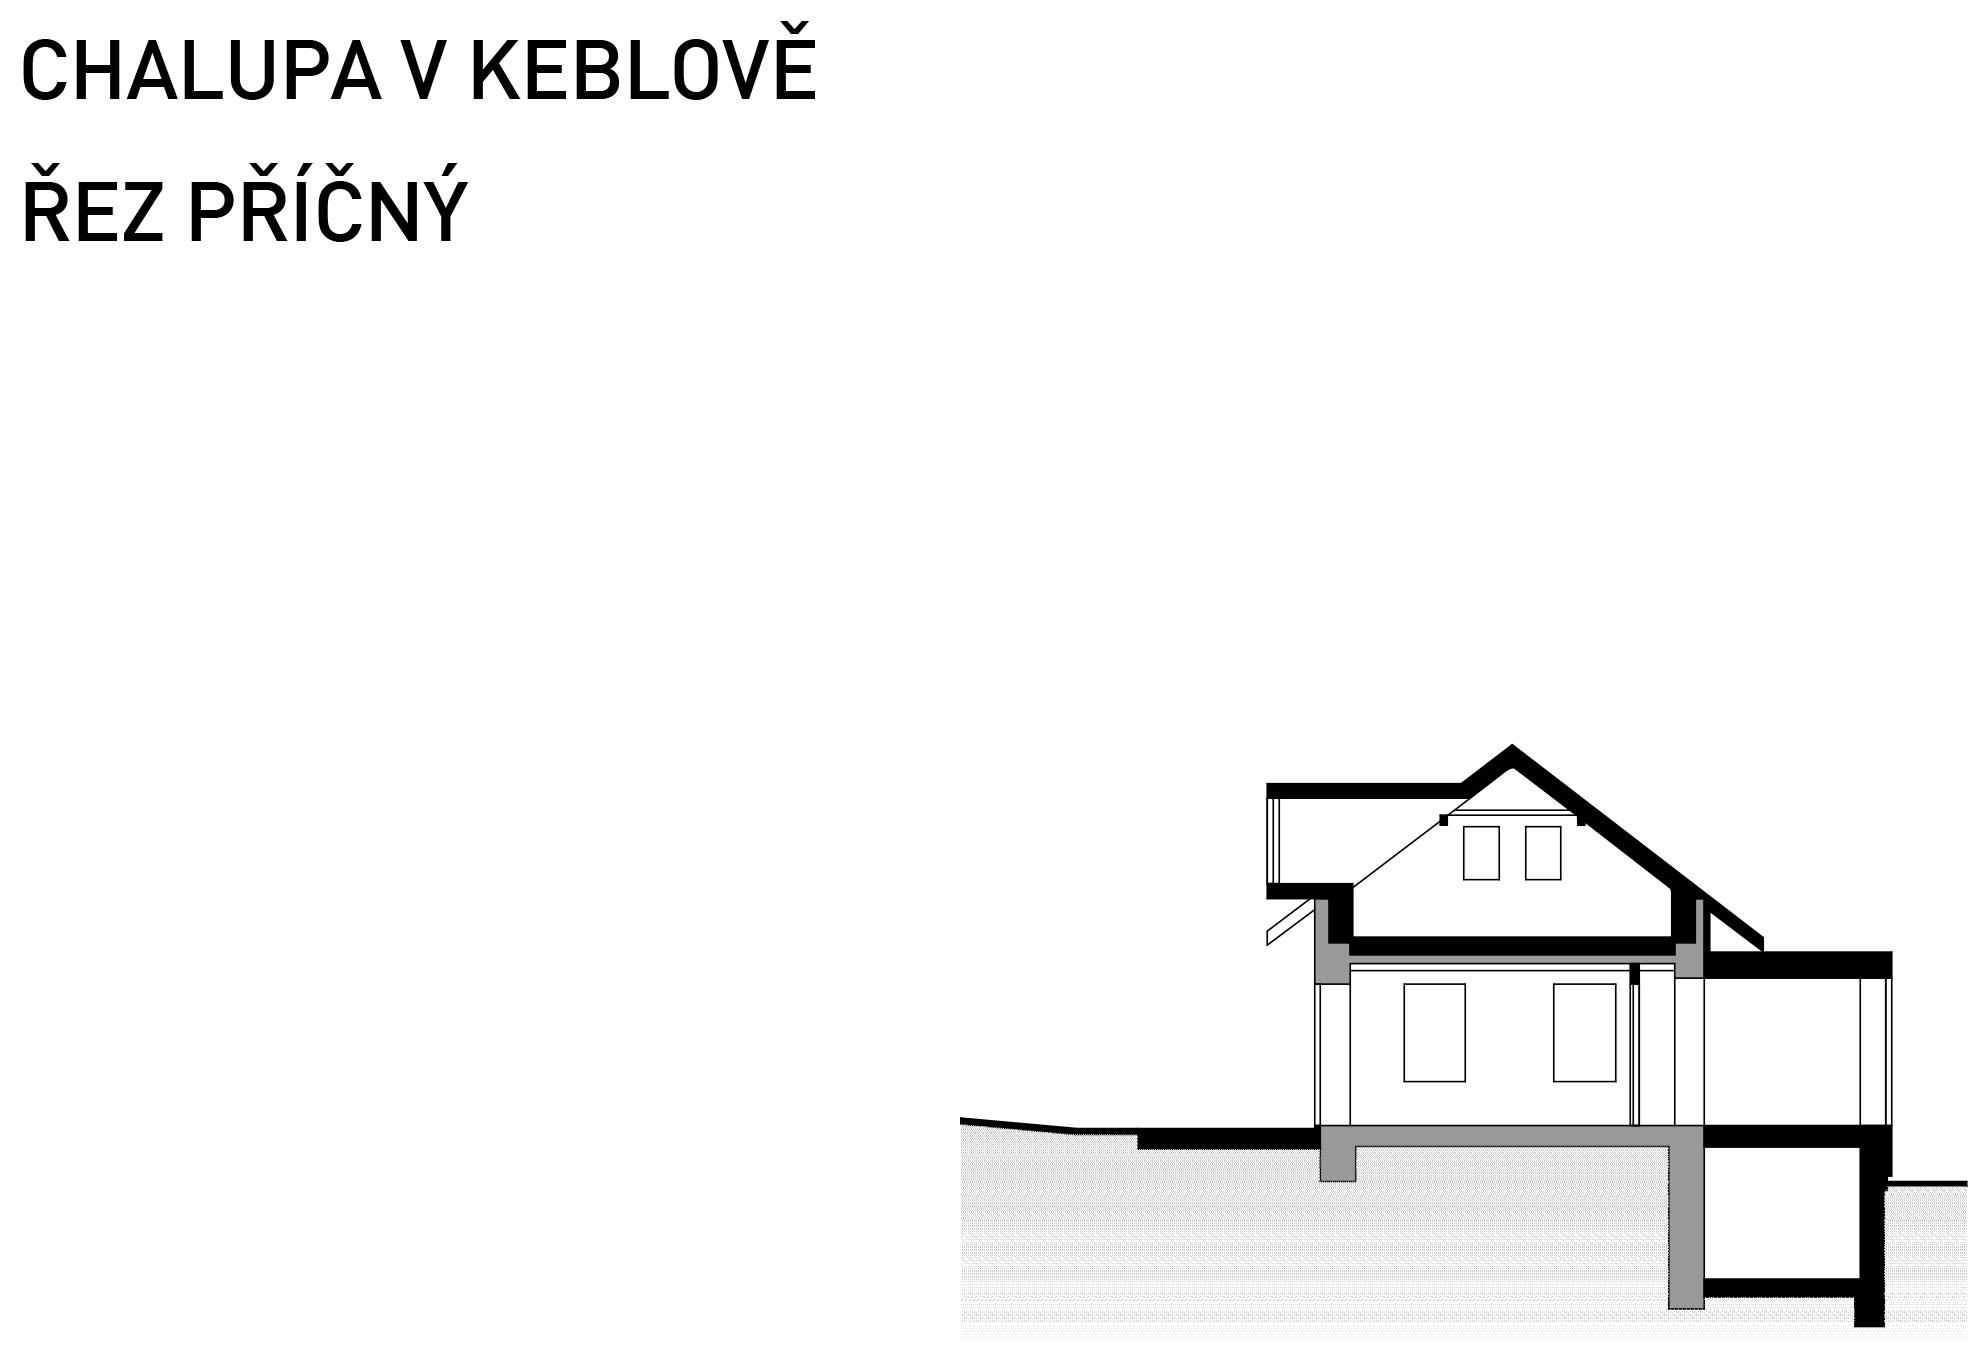 KEBLOV REZ